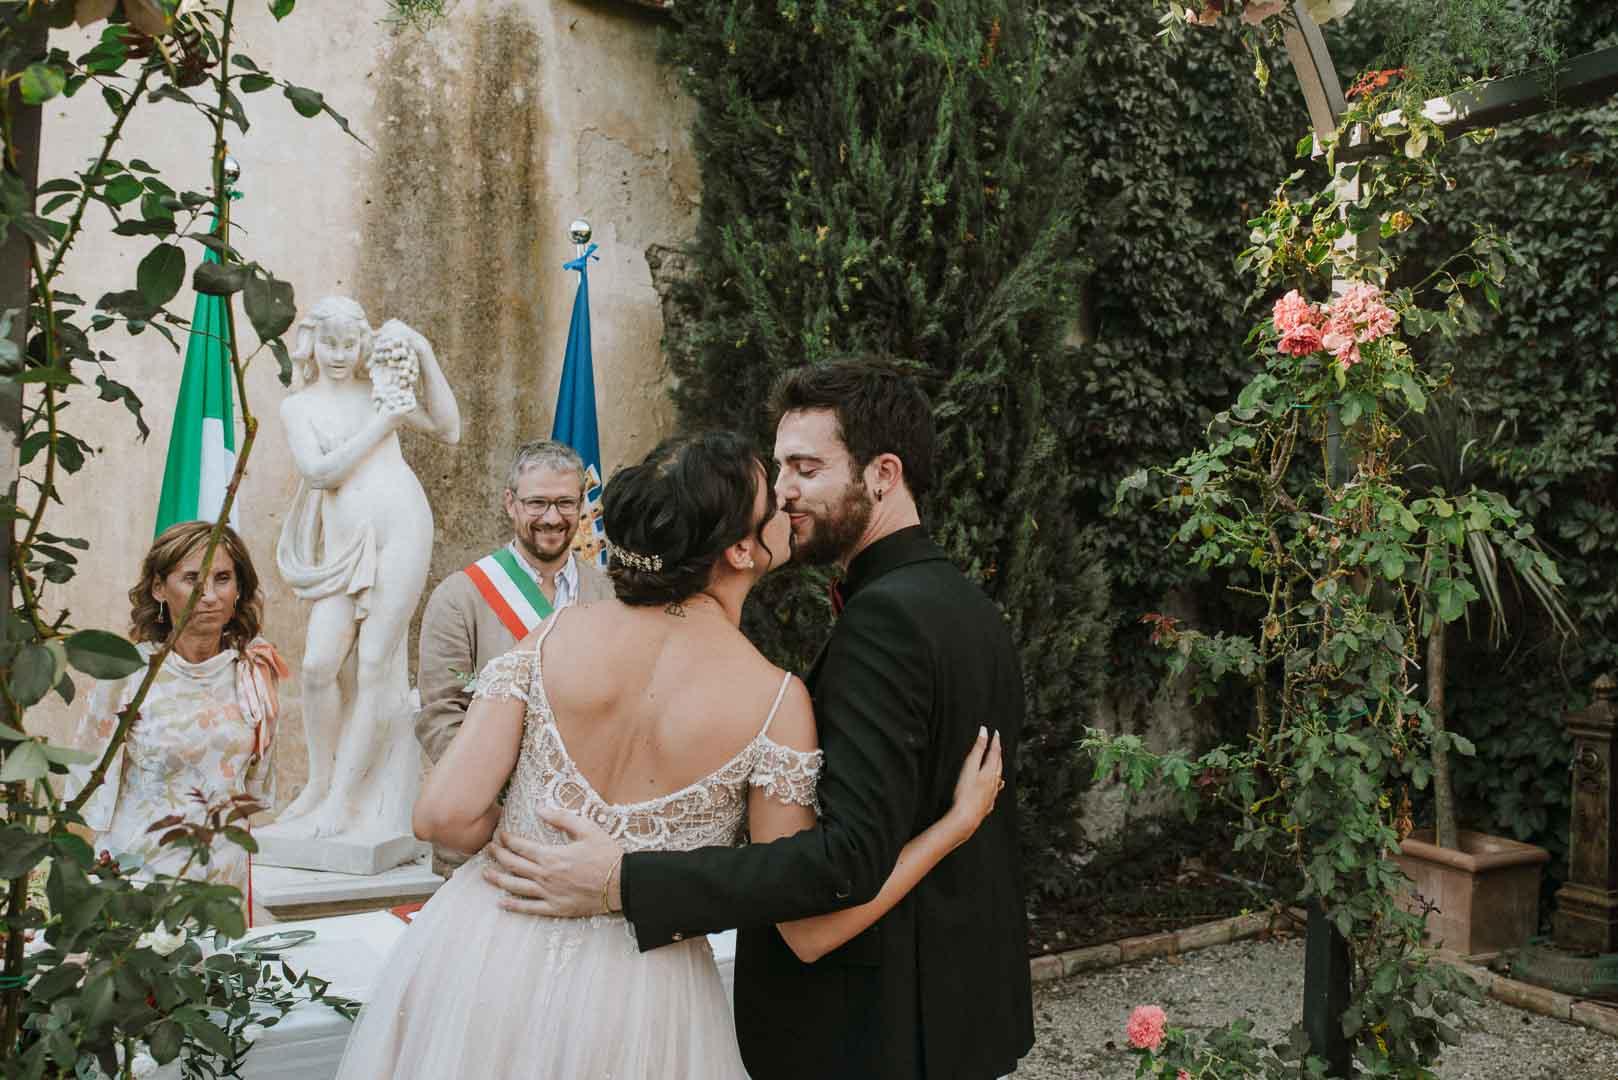 wedding-photographer-destination-fineart-bespoke-reportage-tuscany-villascorzi-vivianeizzo-spazio46-68